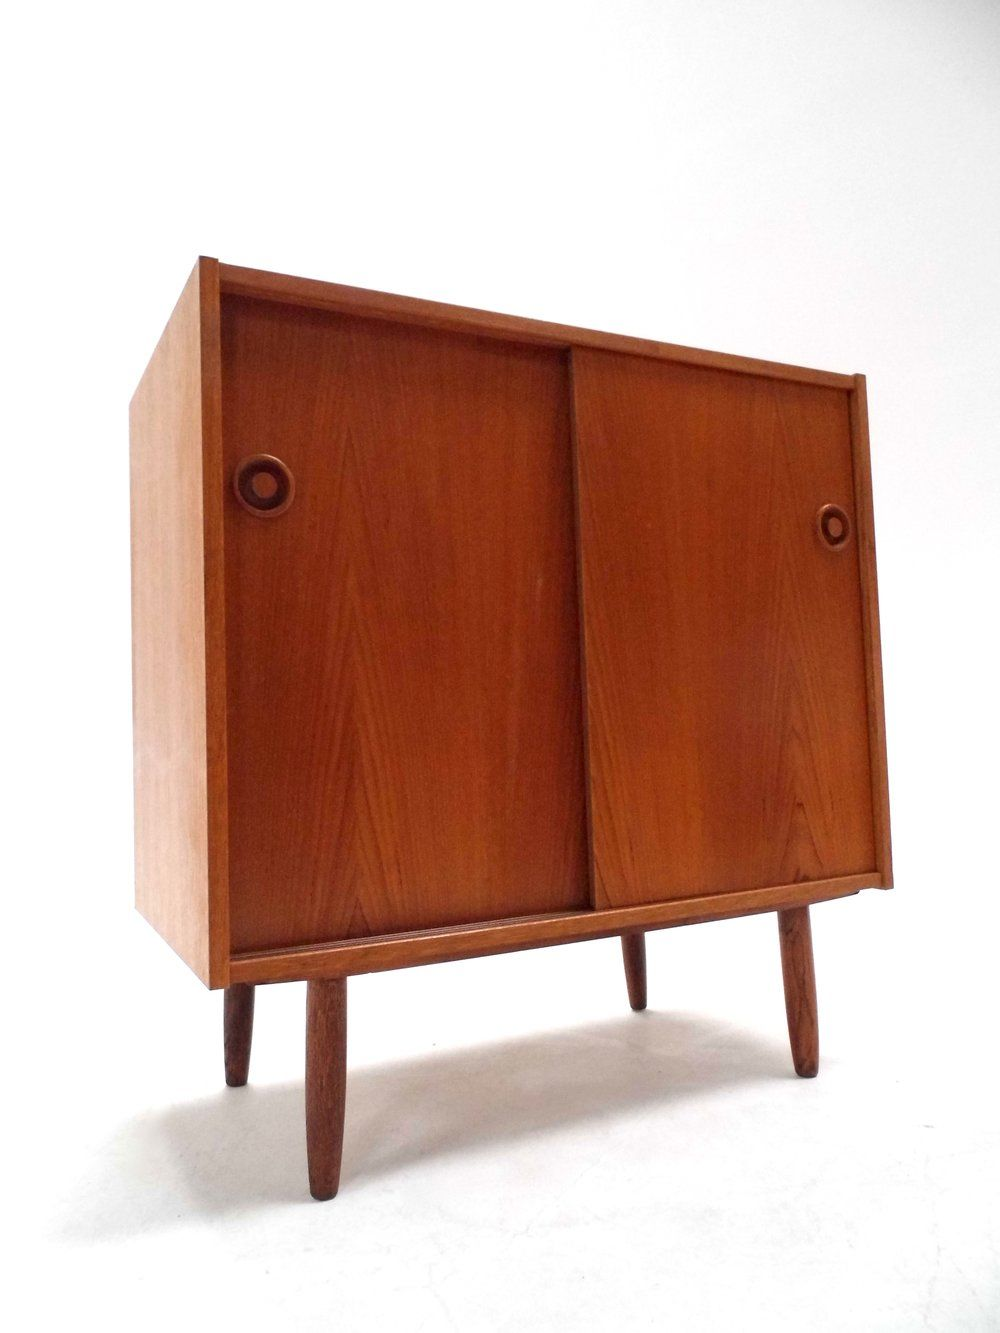 1960s Record Cabinet P12212 Vintage Danish Teak Record Cabinet Storage Unit Sideboard